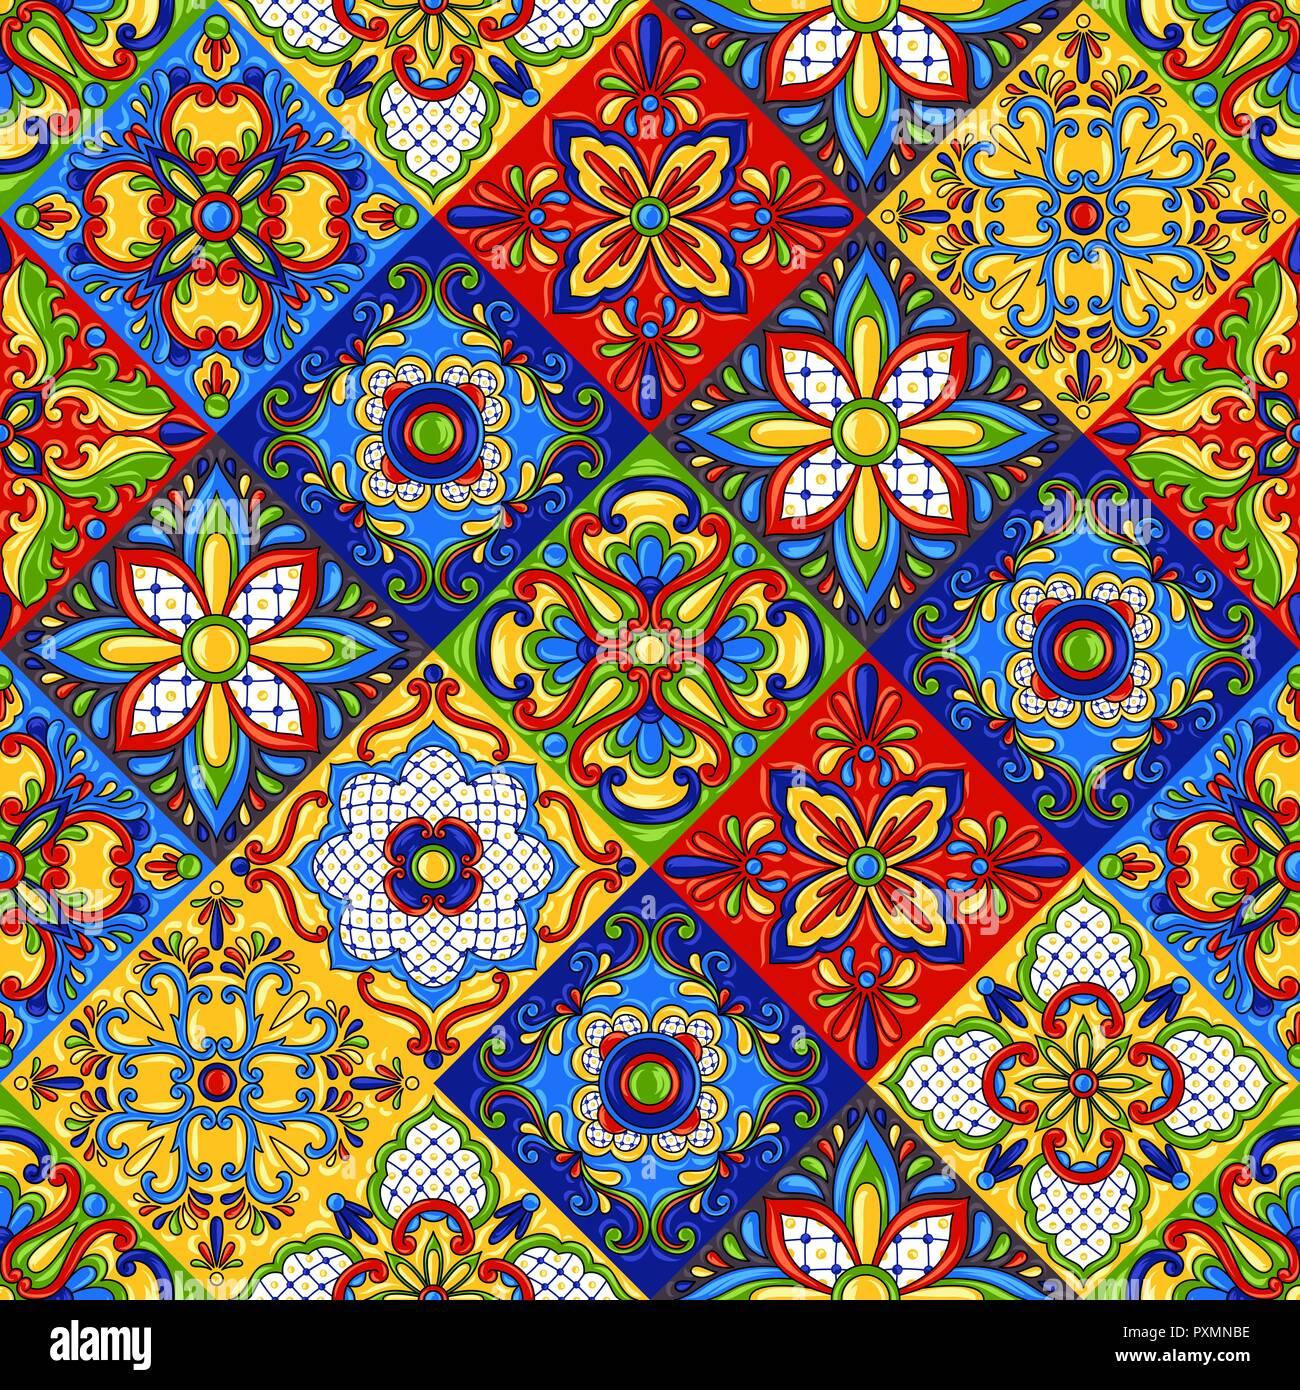 Aztec Print Wallpaper Hd Mexican Talavera Ceramic Tile Seamless Pattern Stock